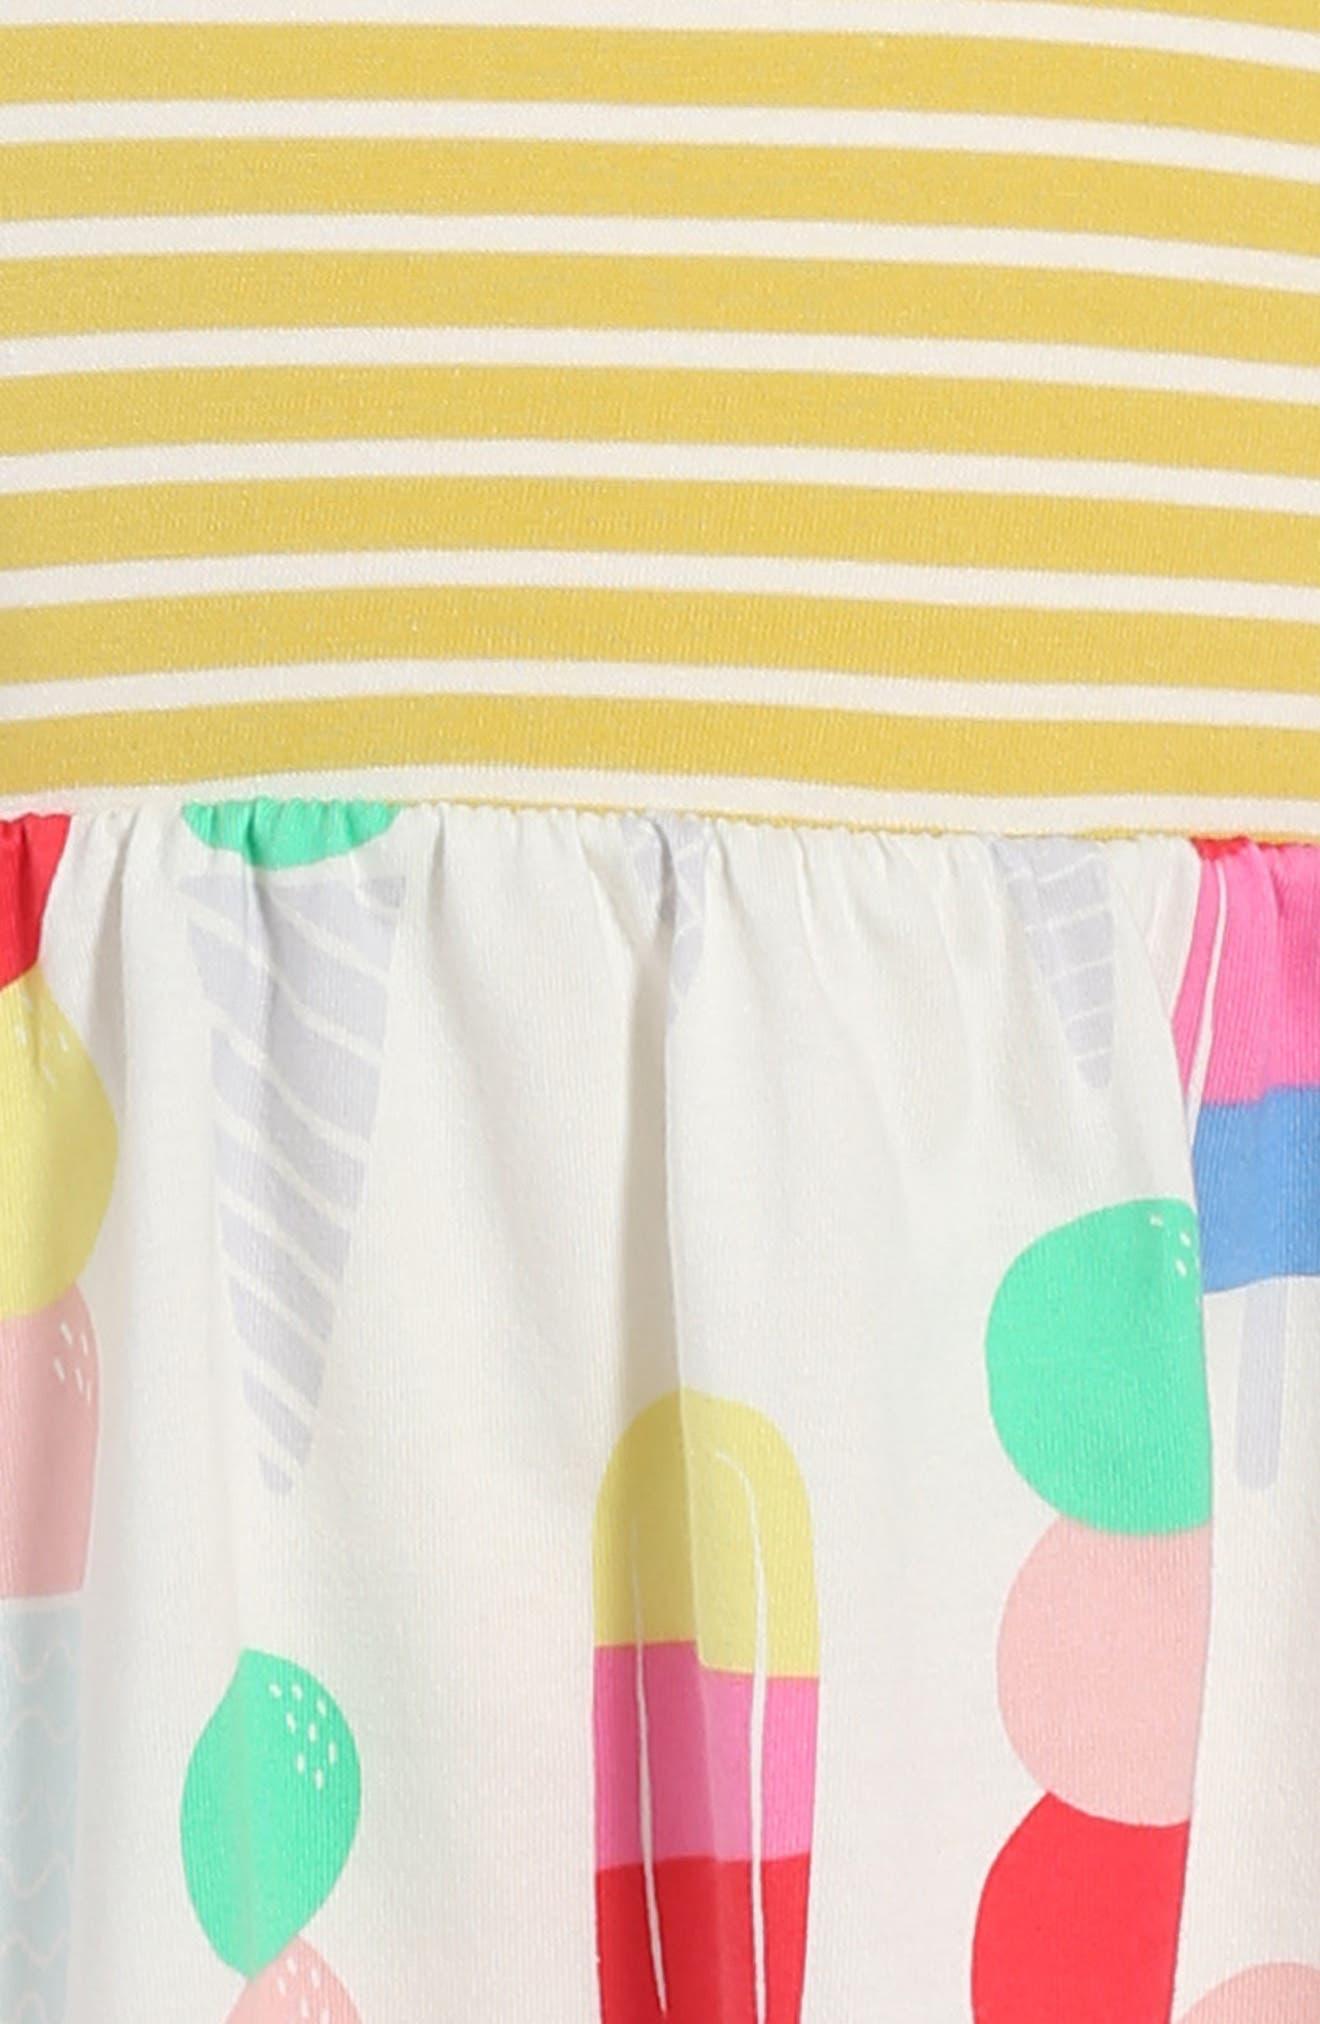 Mixed Print Dress,                             Alternate thumbnail 3, color,                             706